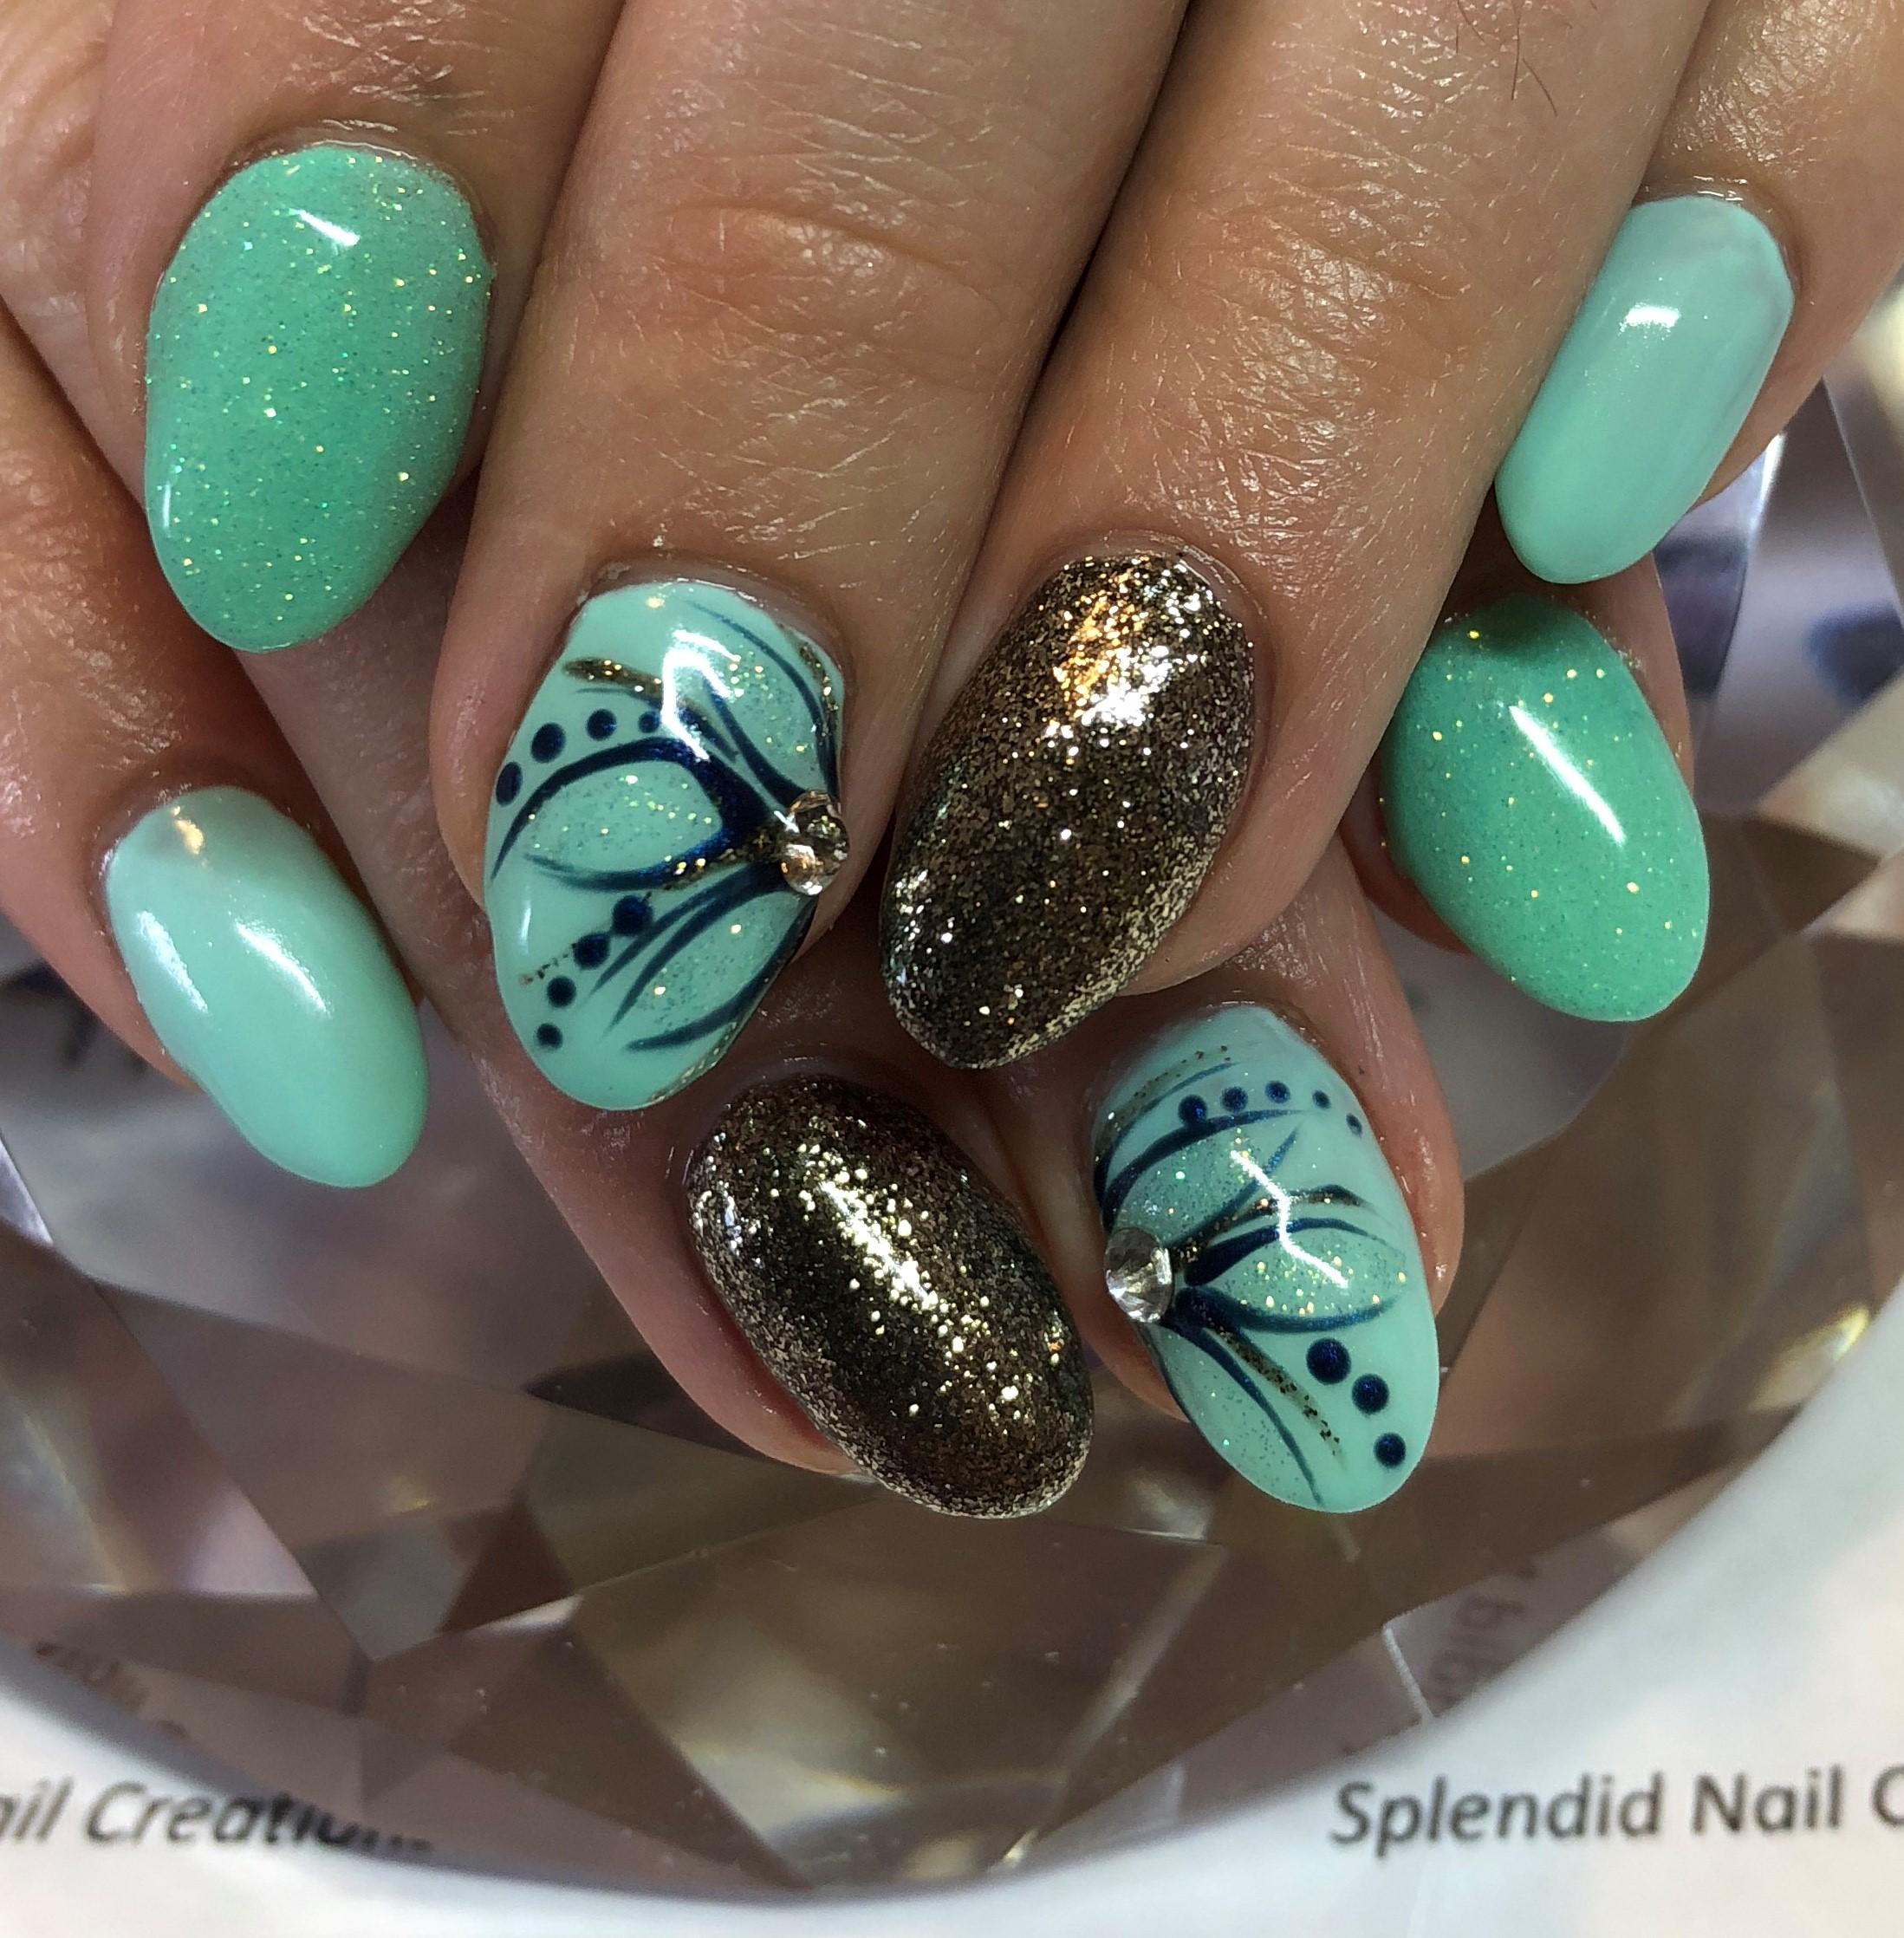 Day 101: Green Flower Nail Art